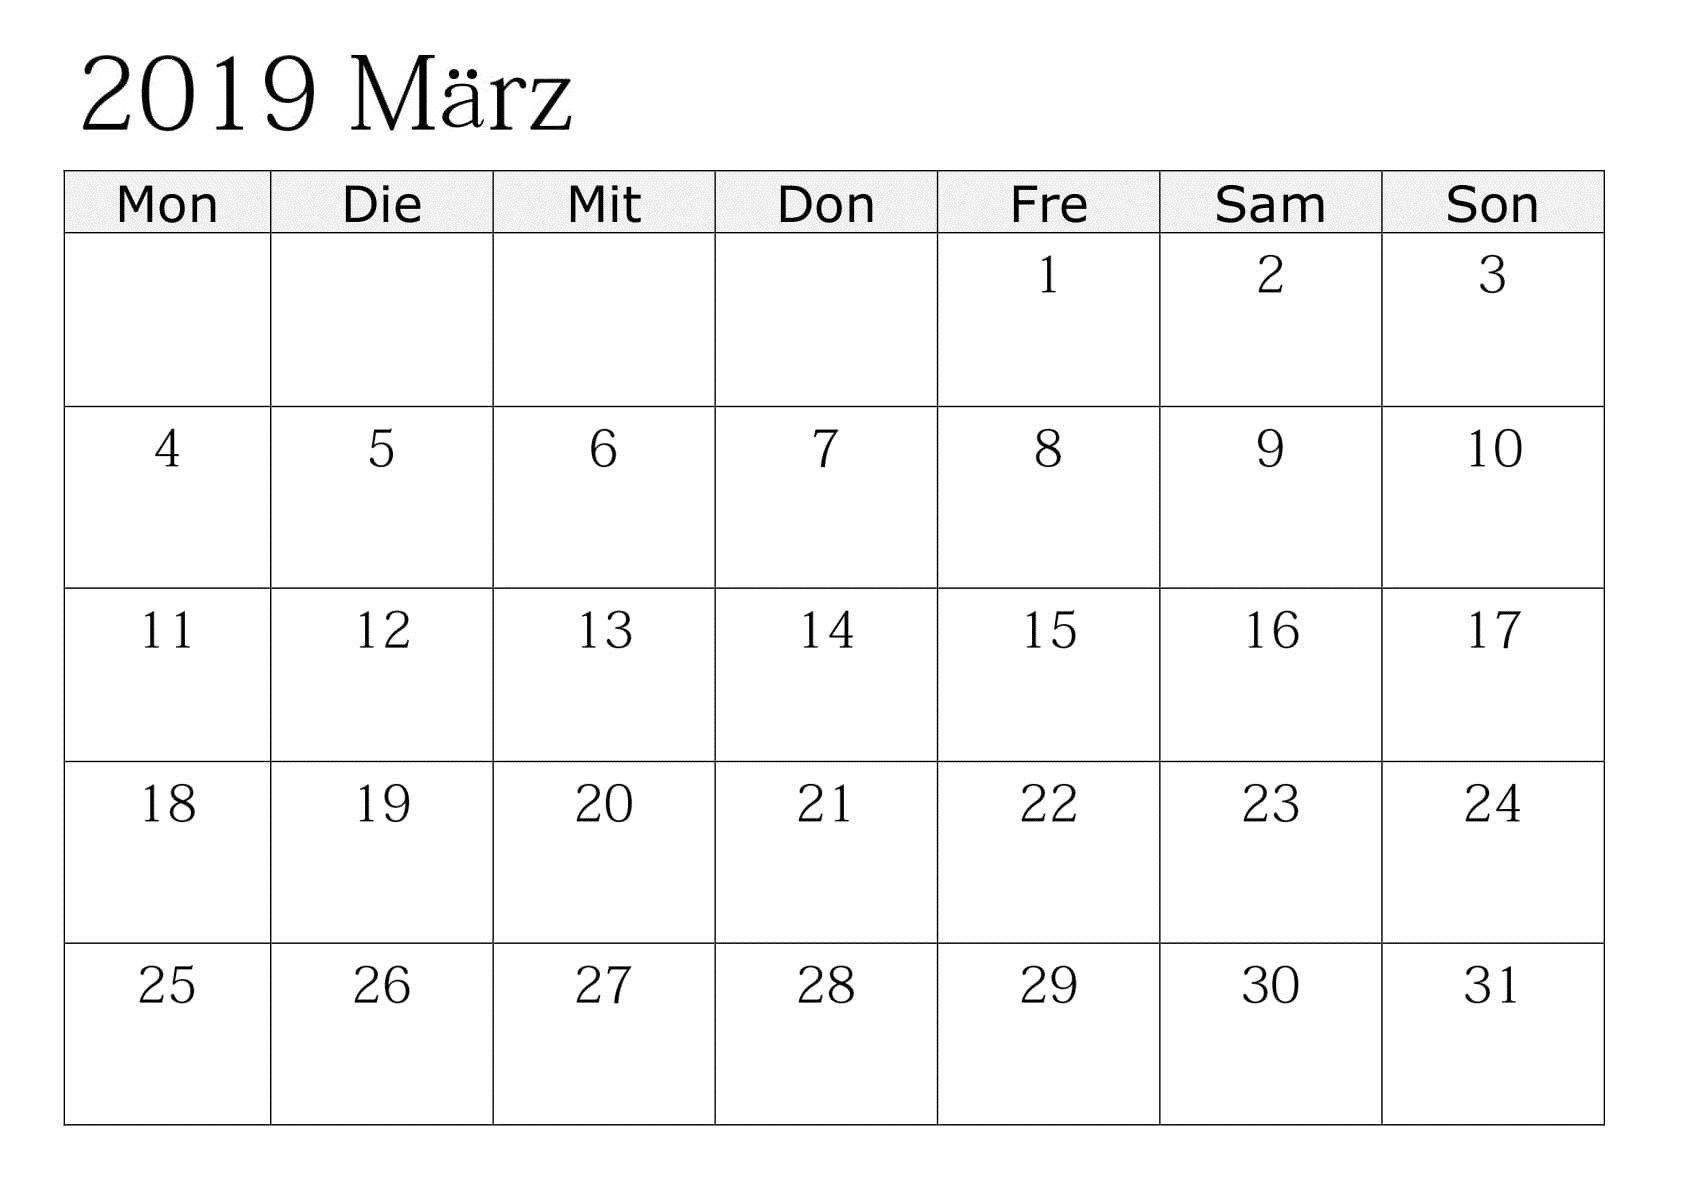 Imprimir Calendario De Enero 2019 Más Populares Kalender März 2019 Zum Ausdrucken